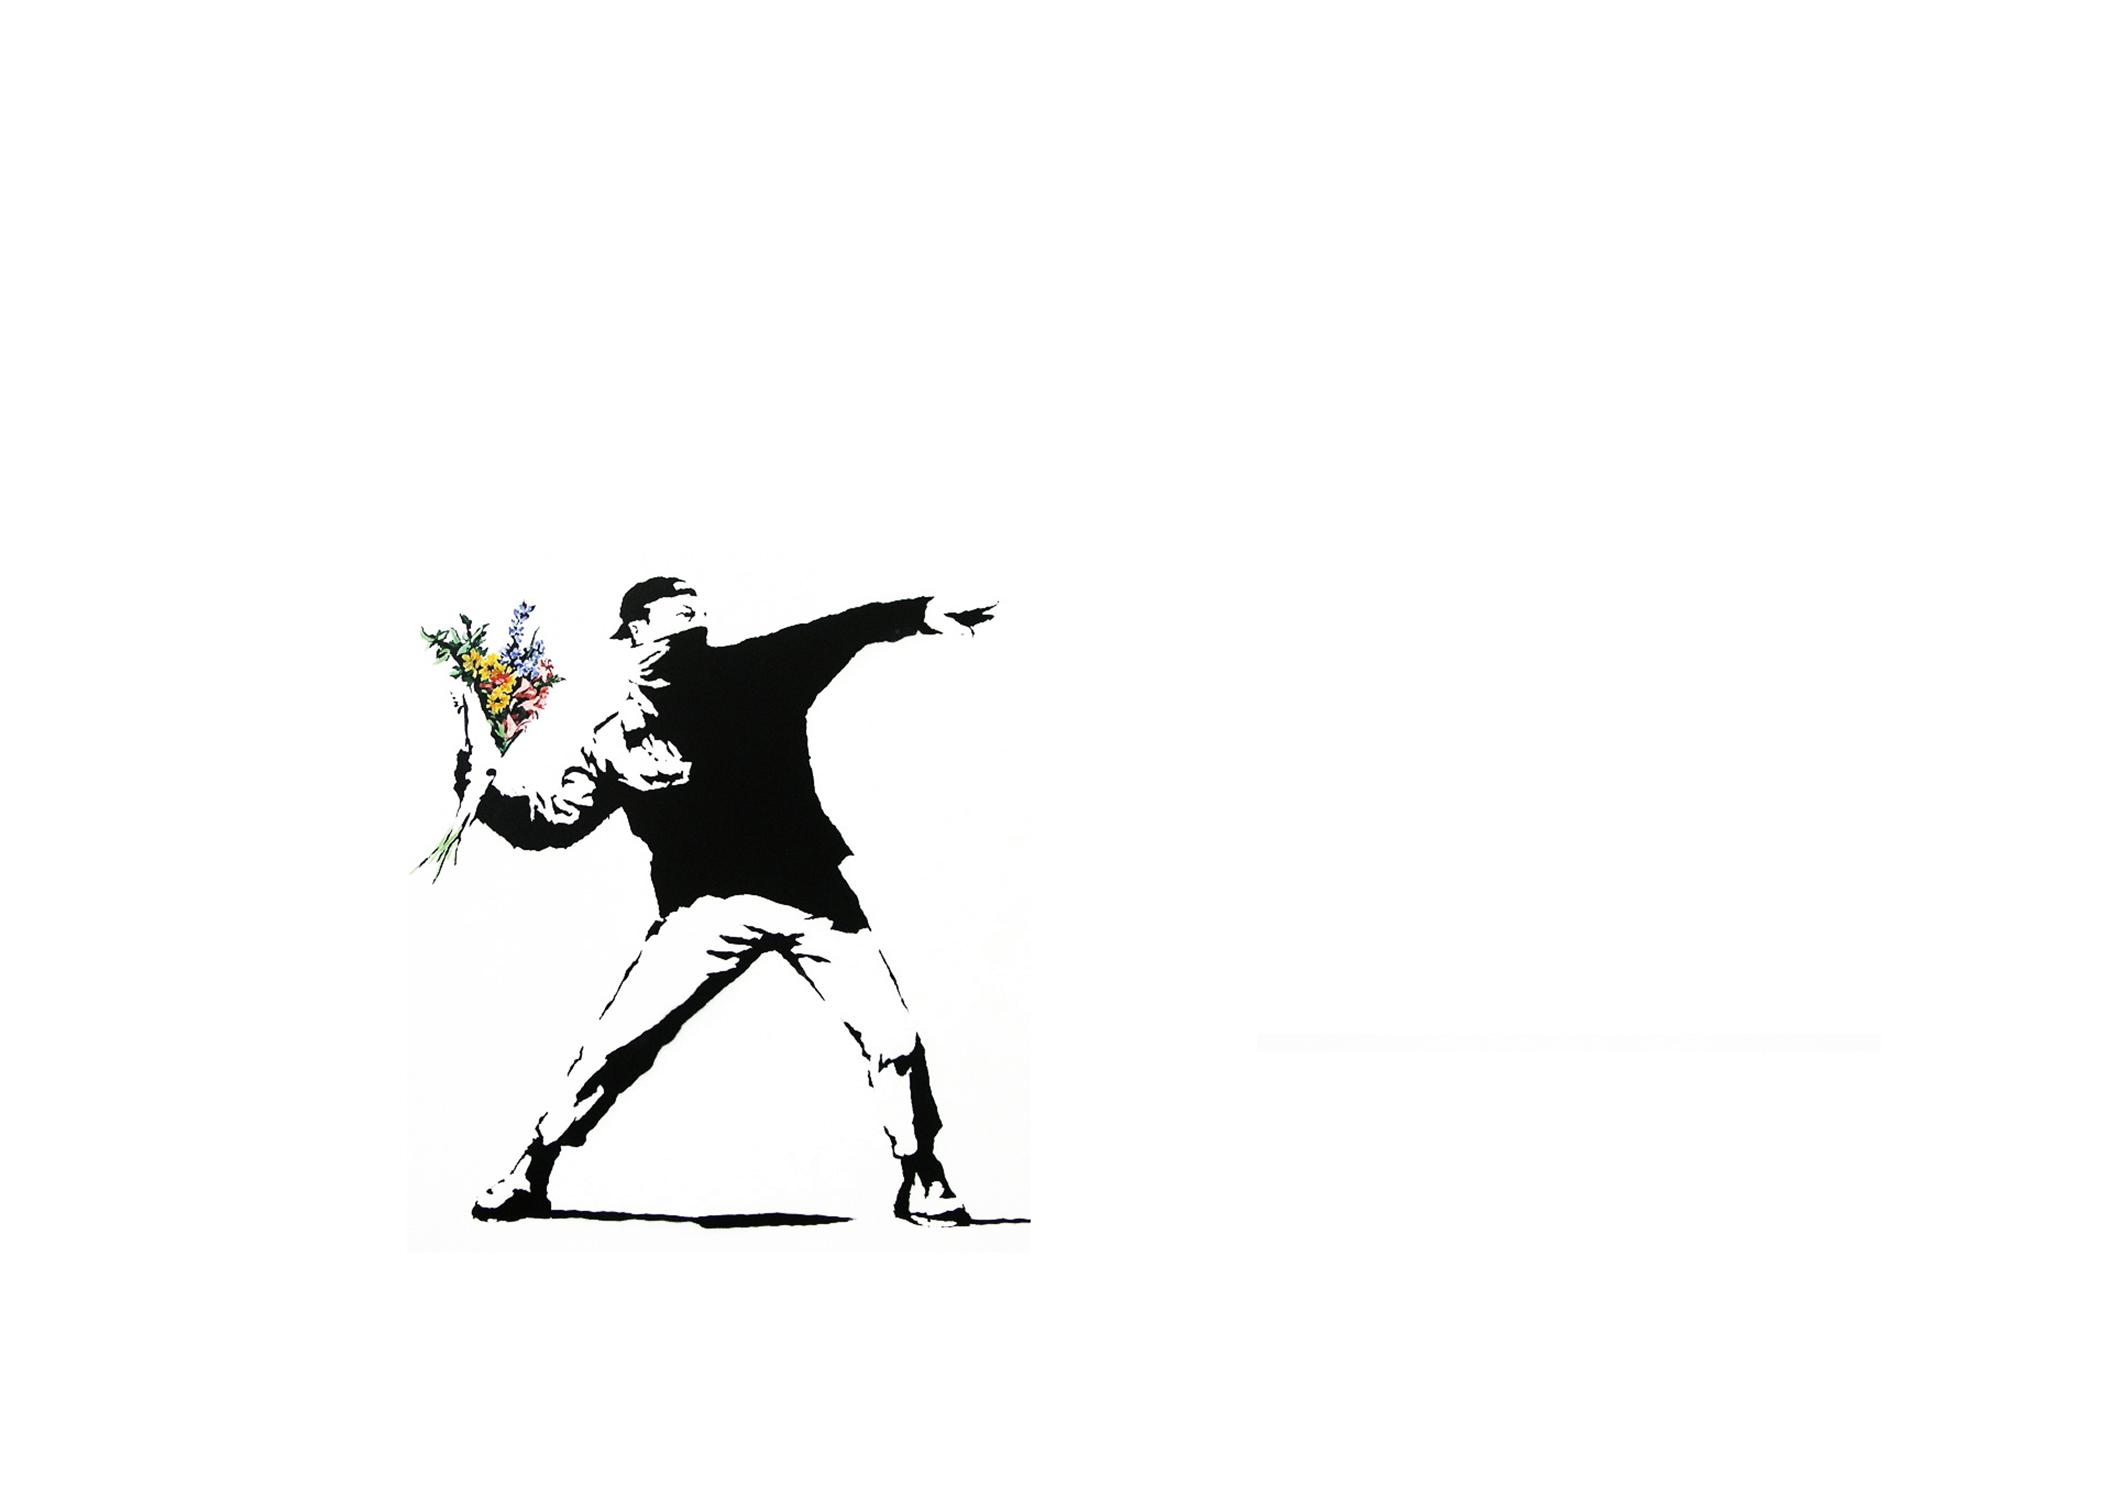 Banksy Hd Wallpaper: Image Result For Banksy Wallpaper